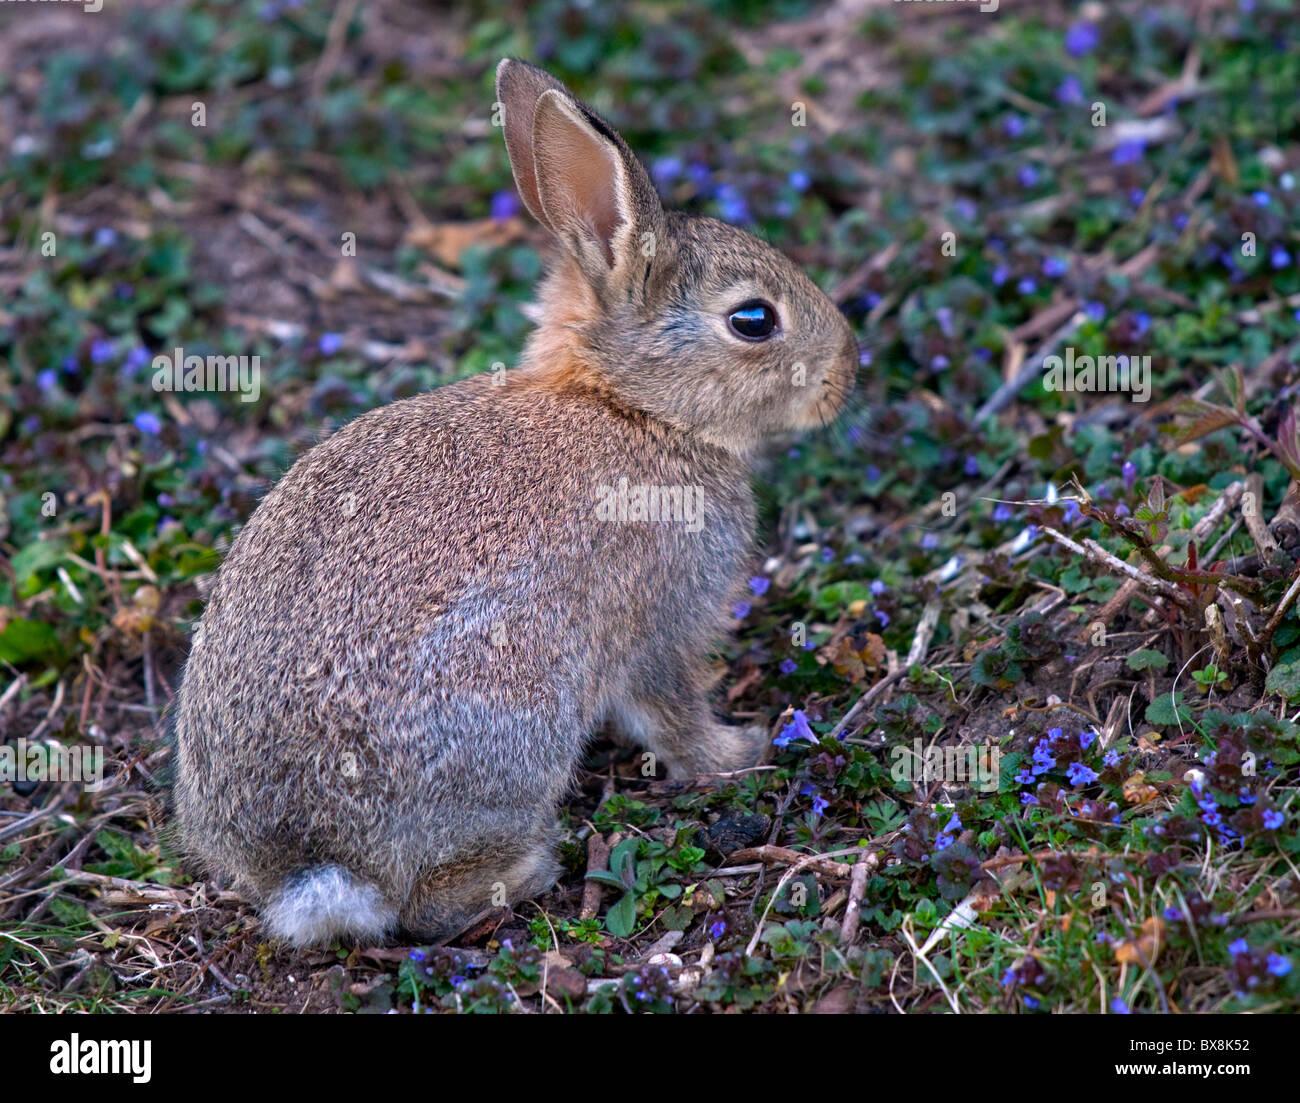 Baby selvatici Coniglio europeo (oryctolagus cuniculus) Immagini Stock